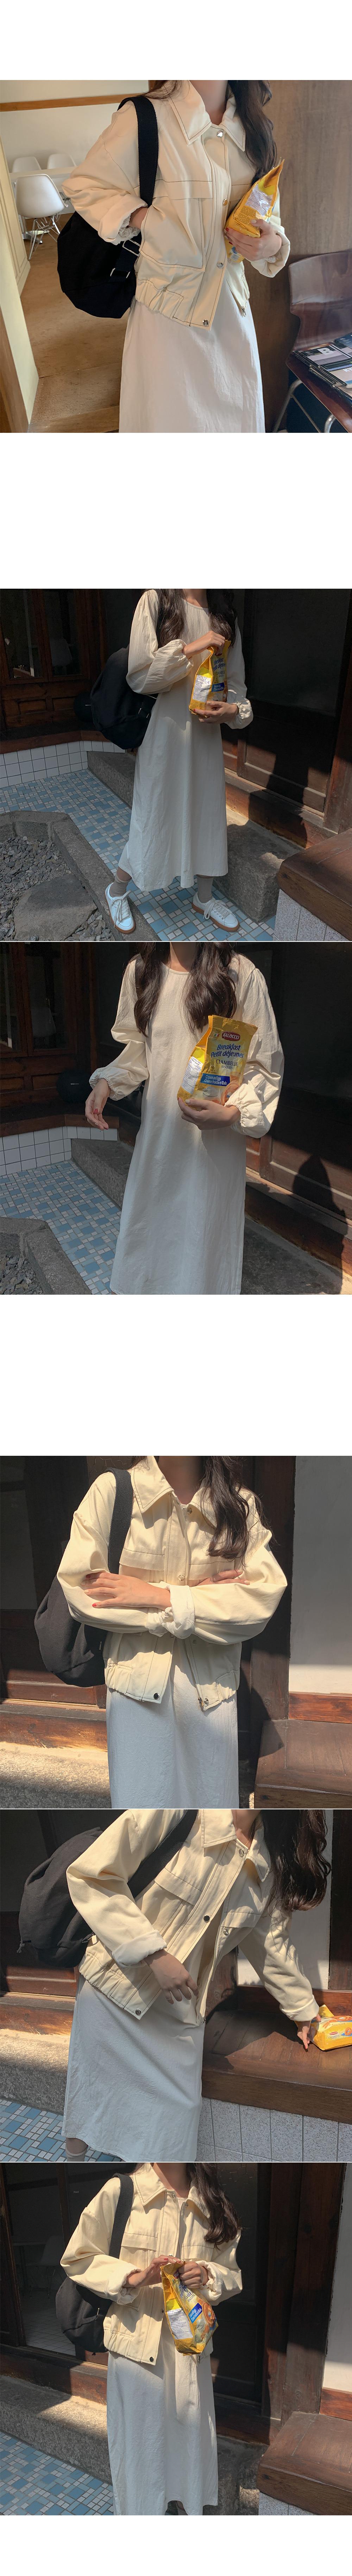 Prime Cotton Dress